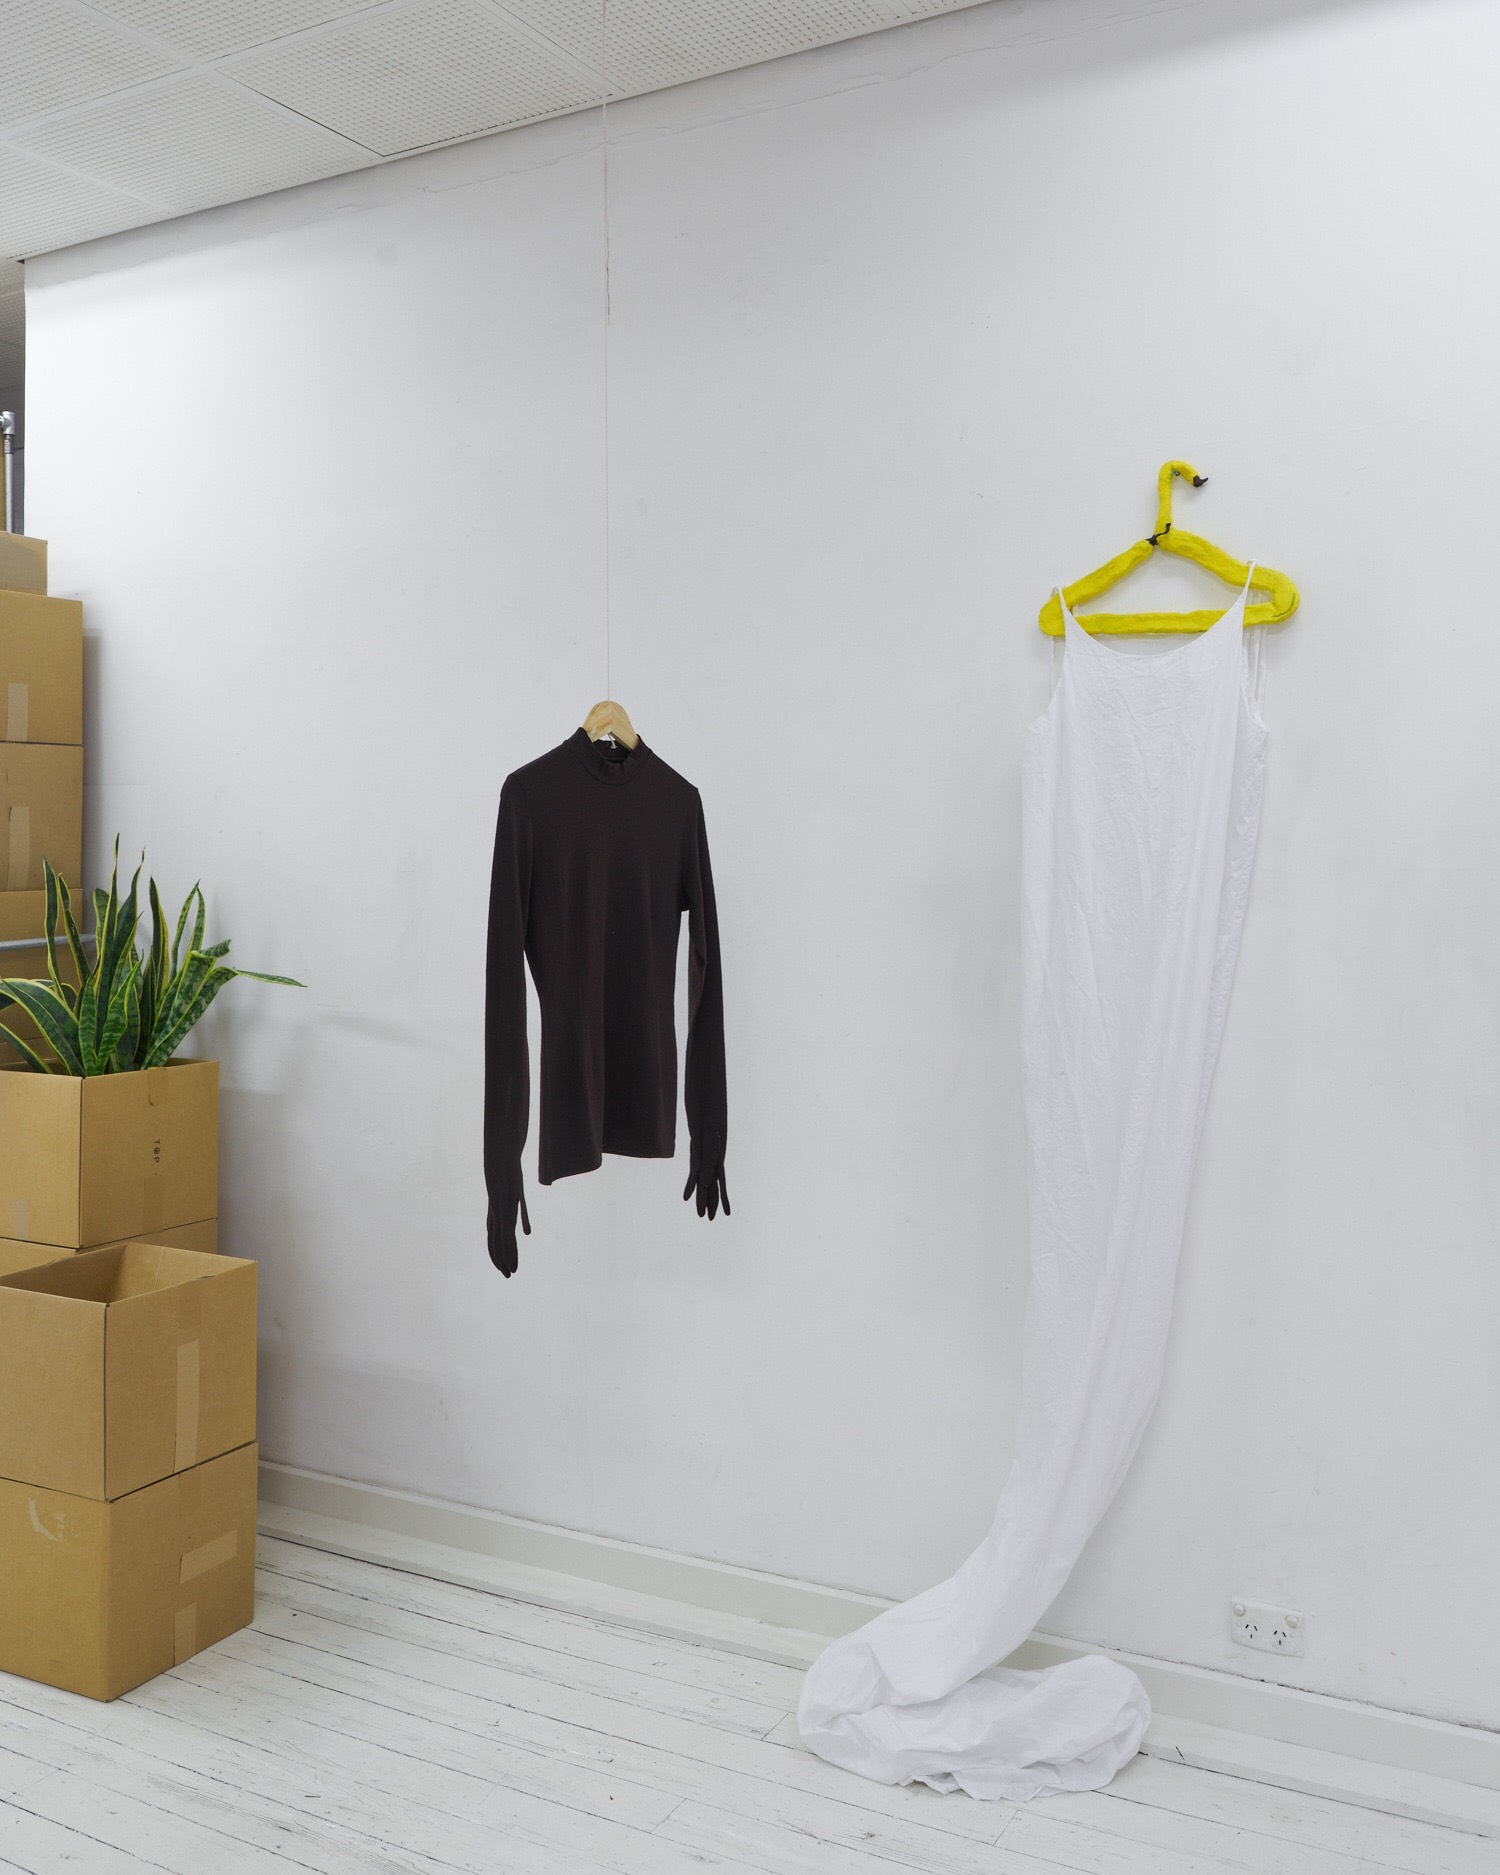 right: Tara Rowhani-Farid,    Oh no no no , 2019.   Air-drying clay, coat hanger, acrylic paint.